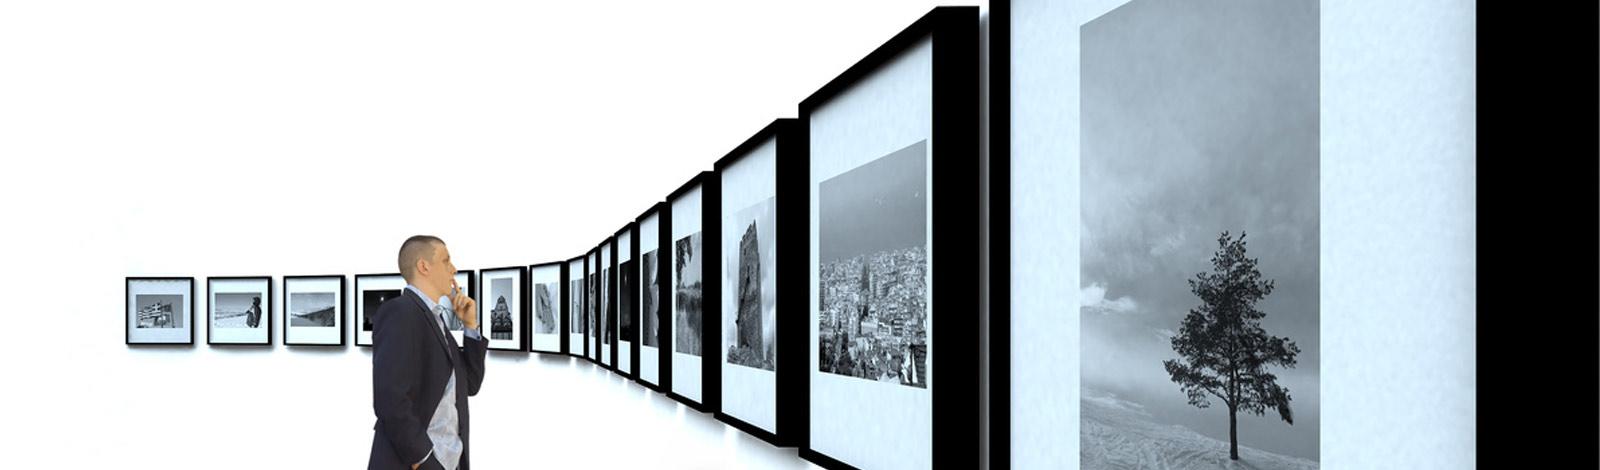 slide-exhibition21